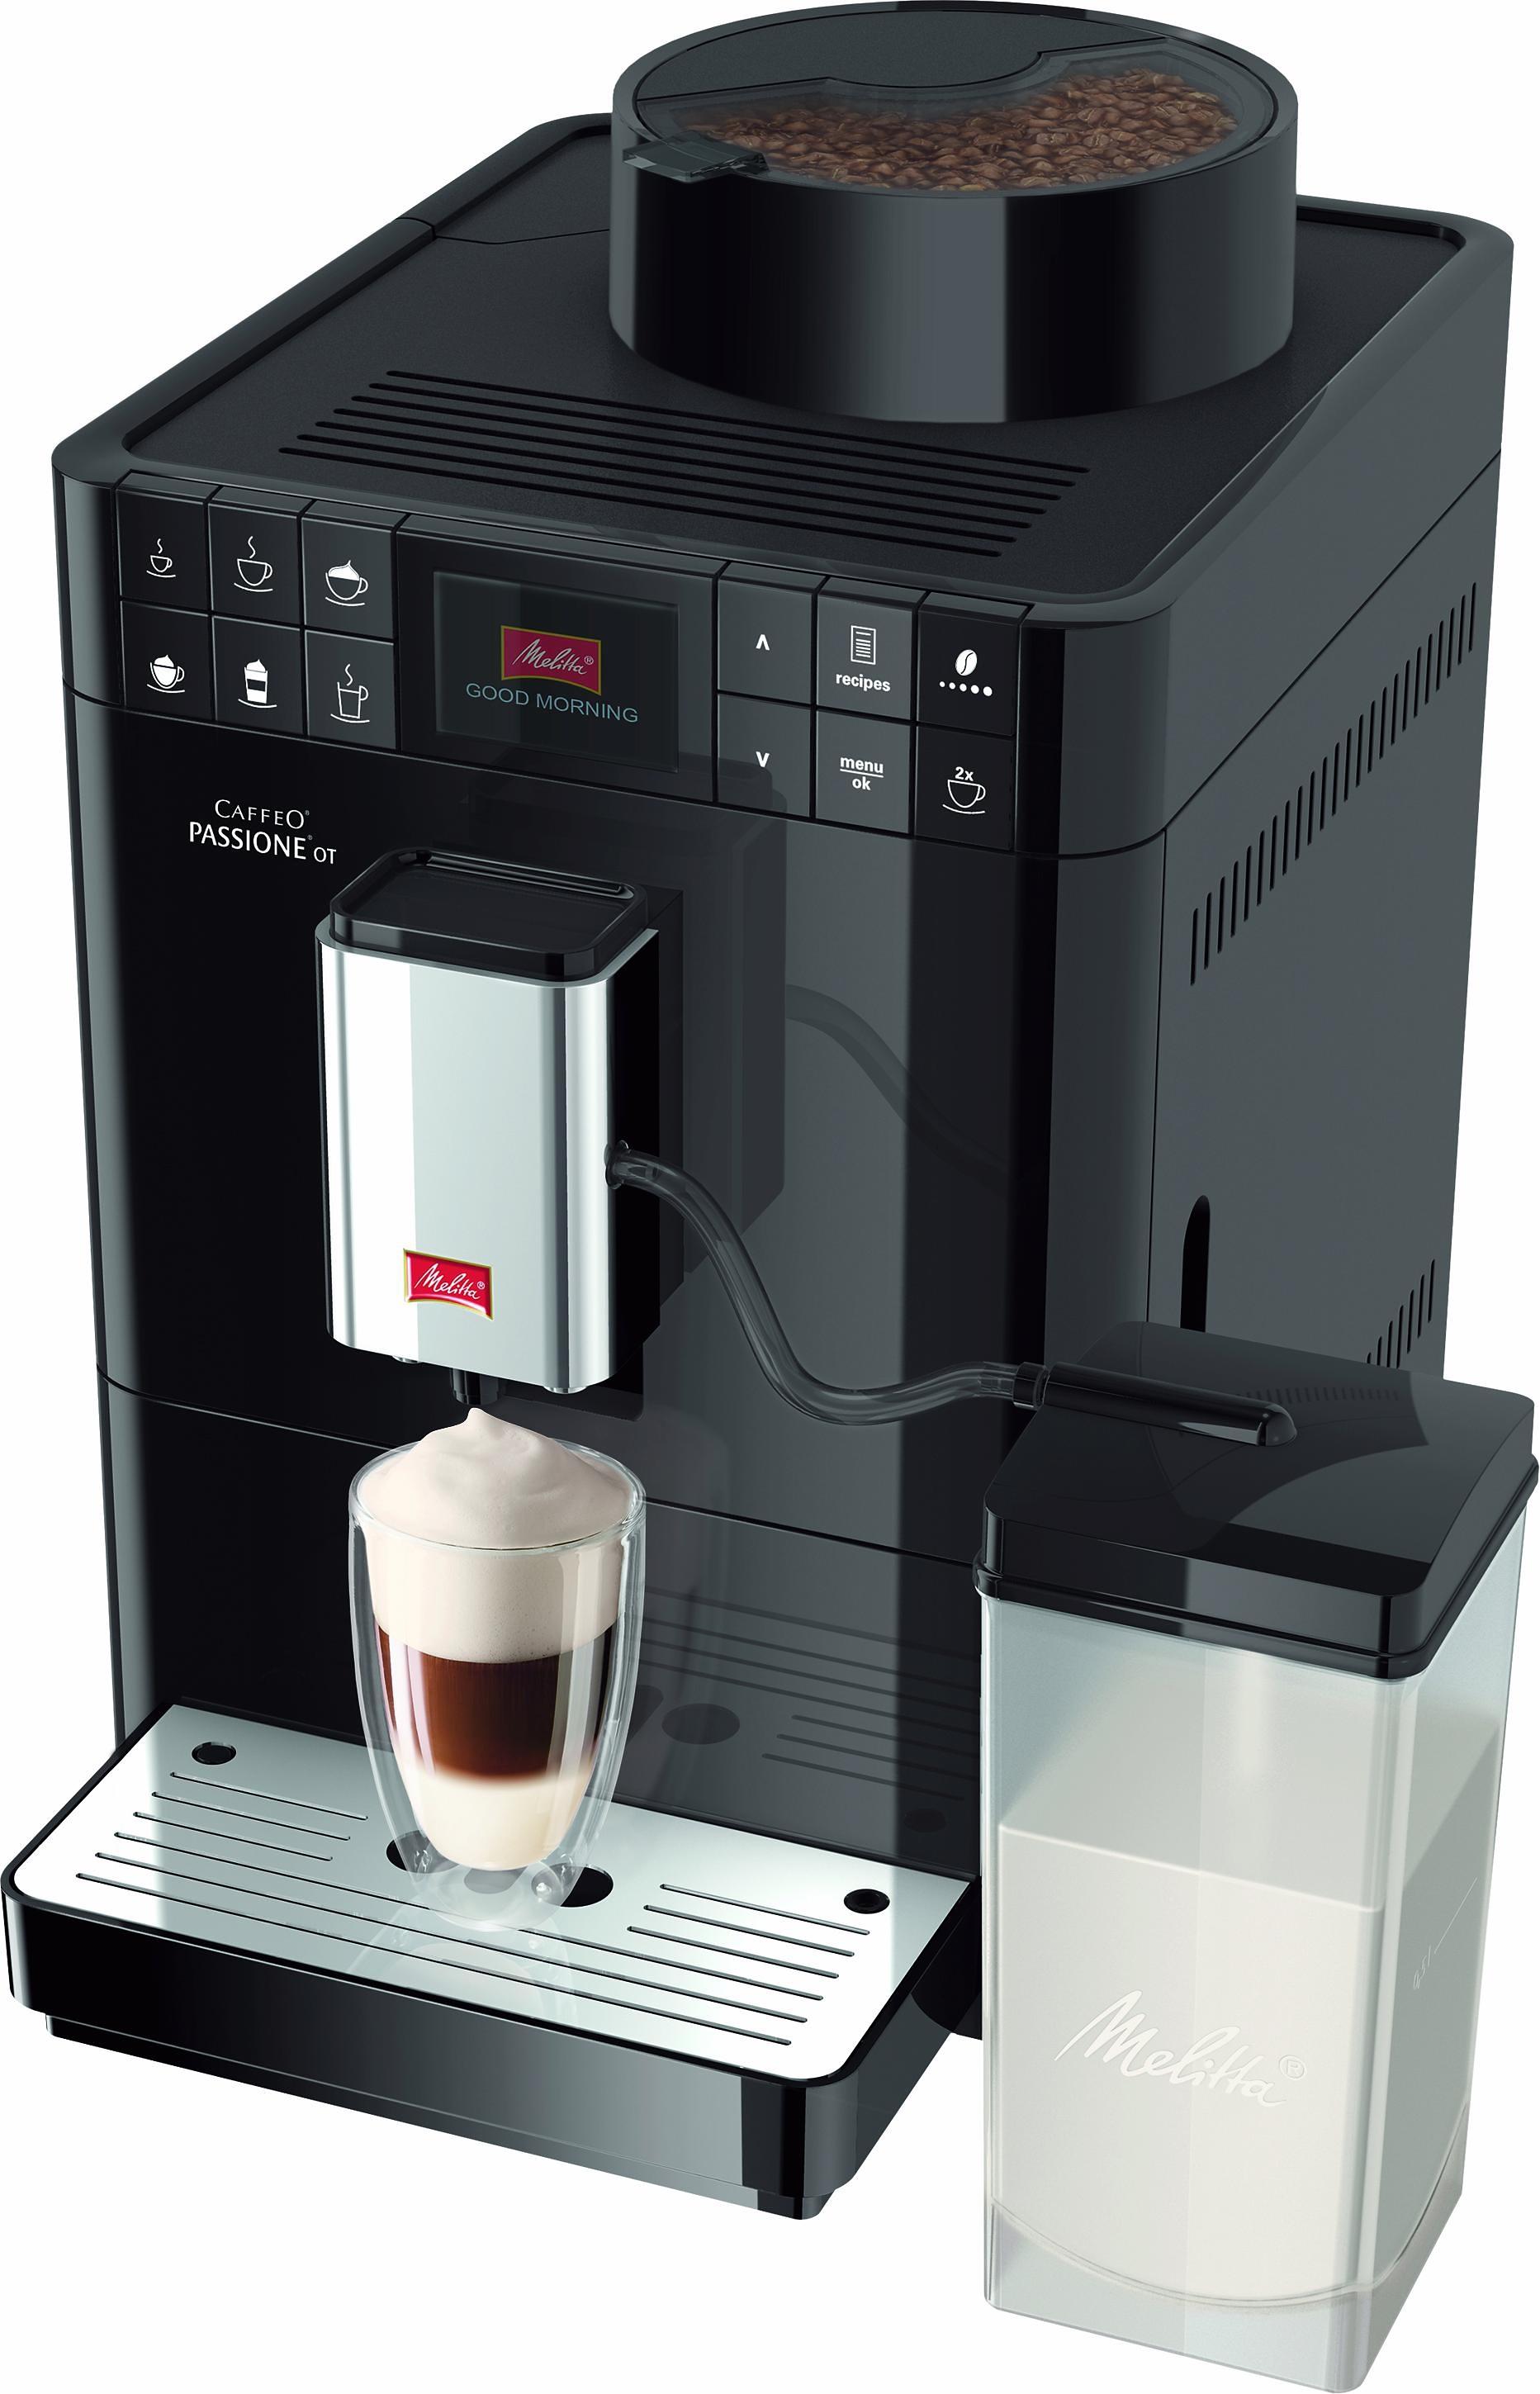 Melitta volautomatisch koffiezetapparaat Caffeo Passione OT F53/1-102, zwart online kopen op otto.nl